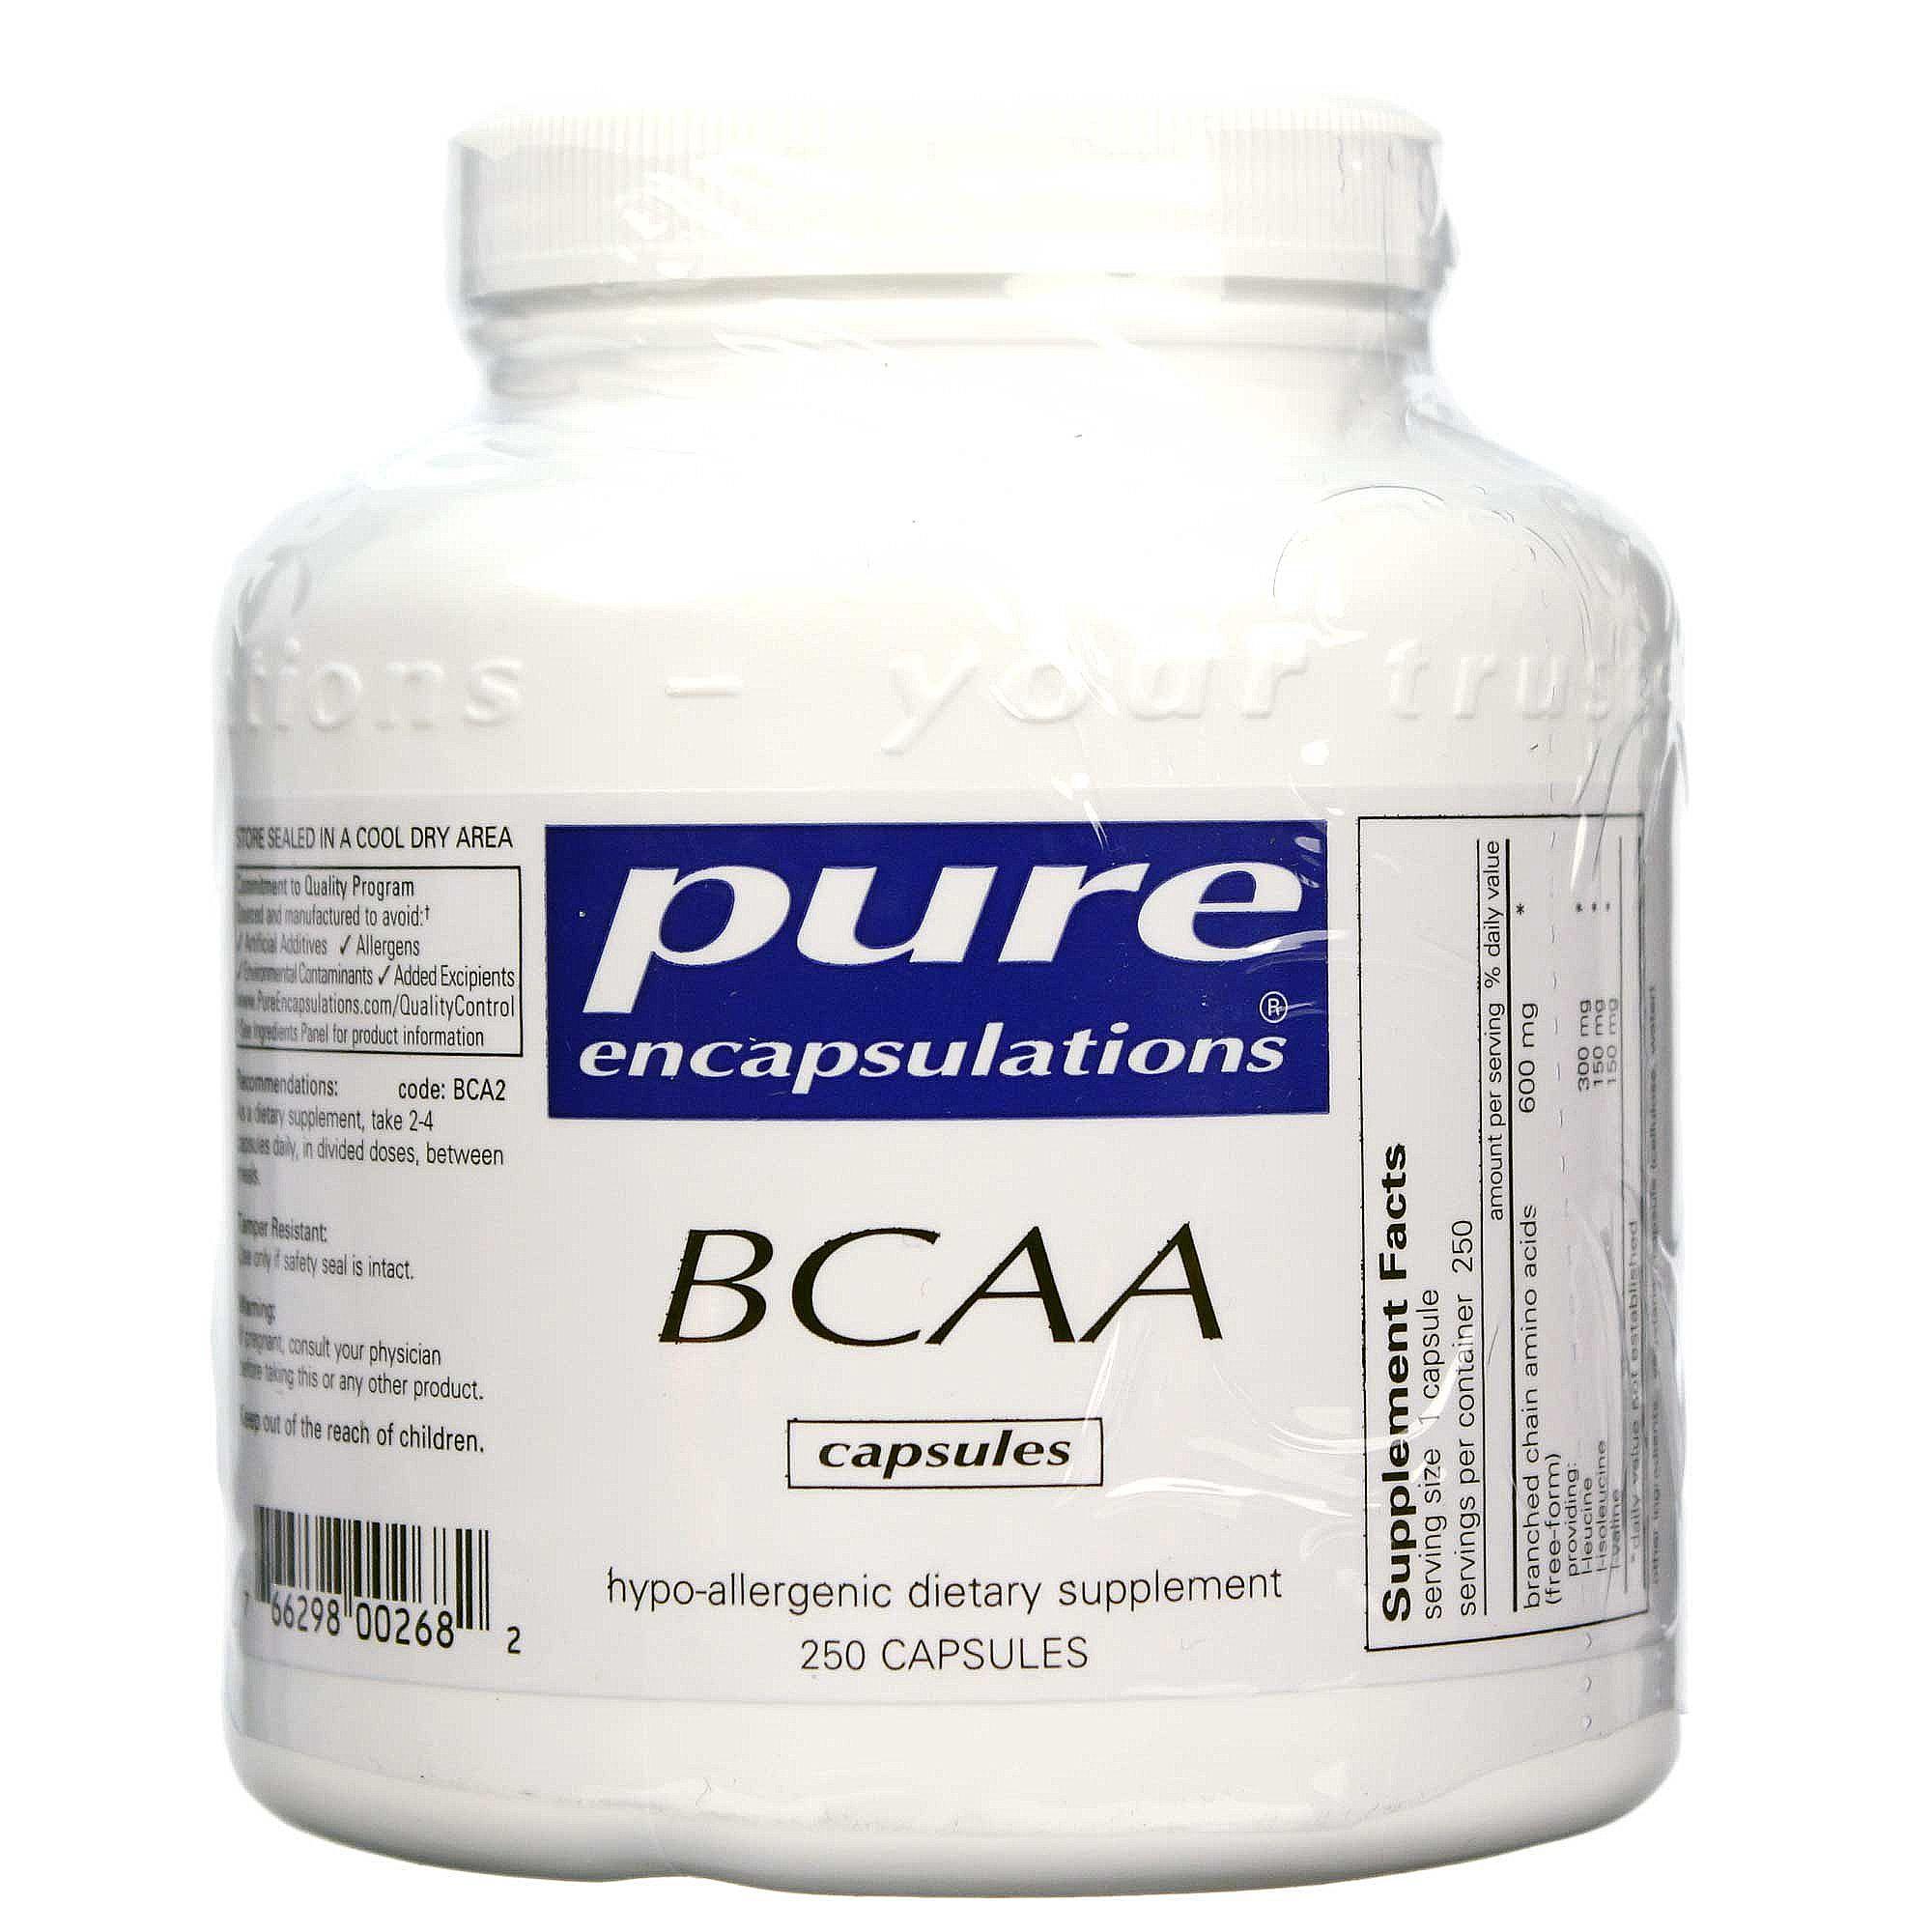 Pure Encapsulations BCAA - 250 Capsules